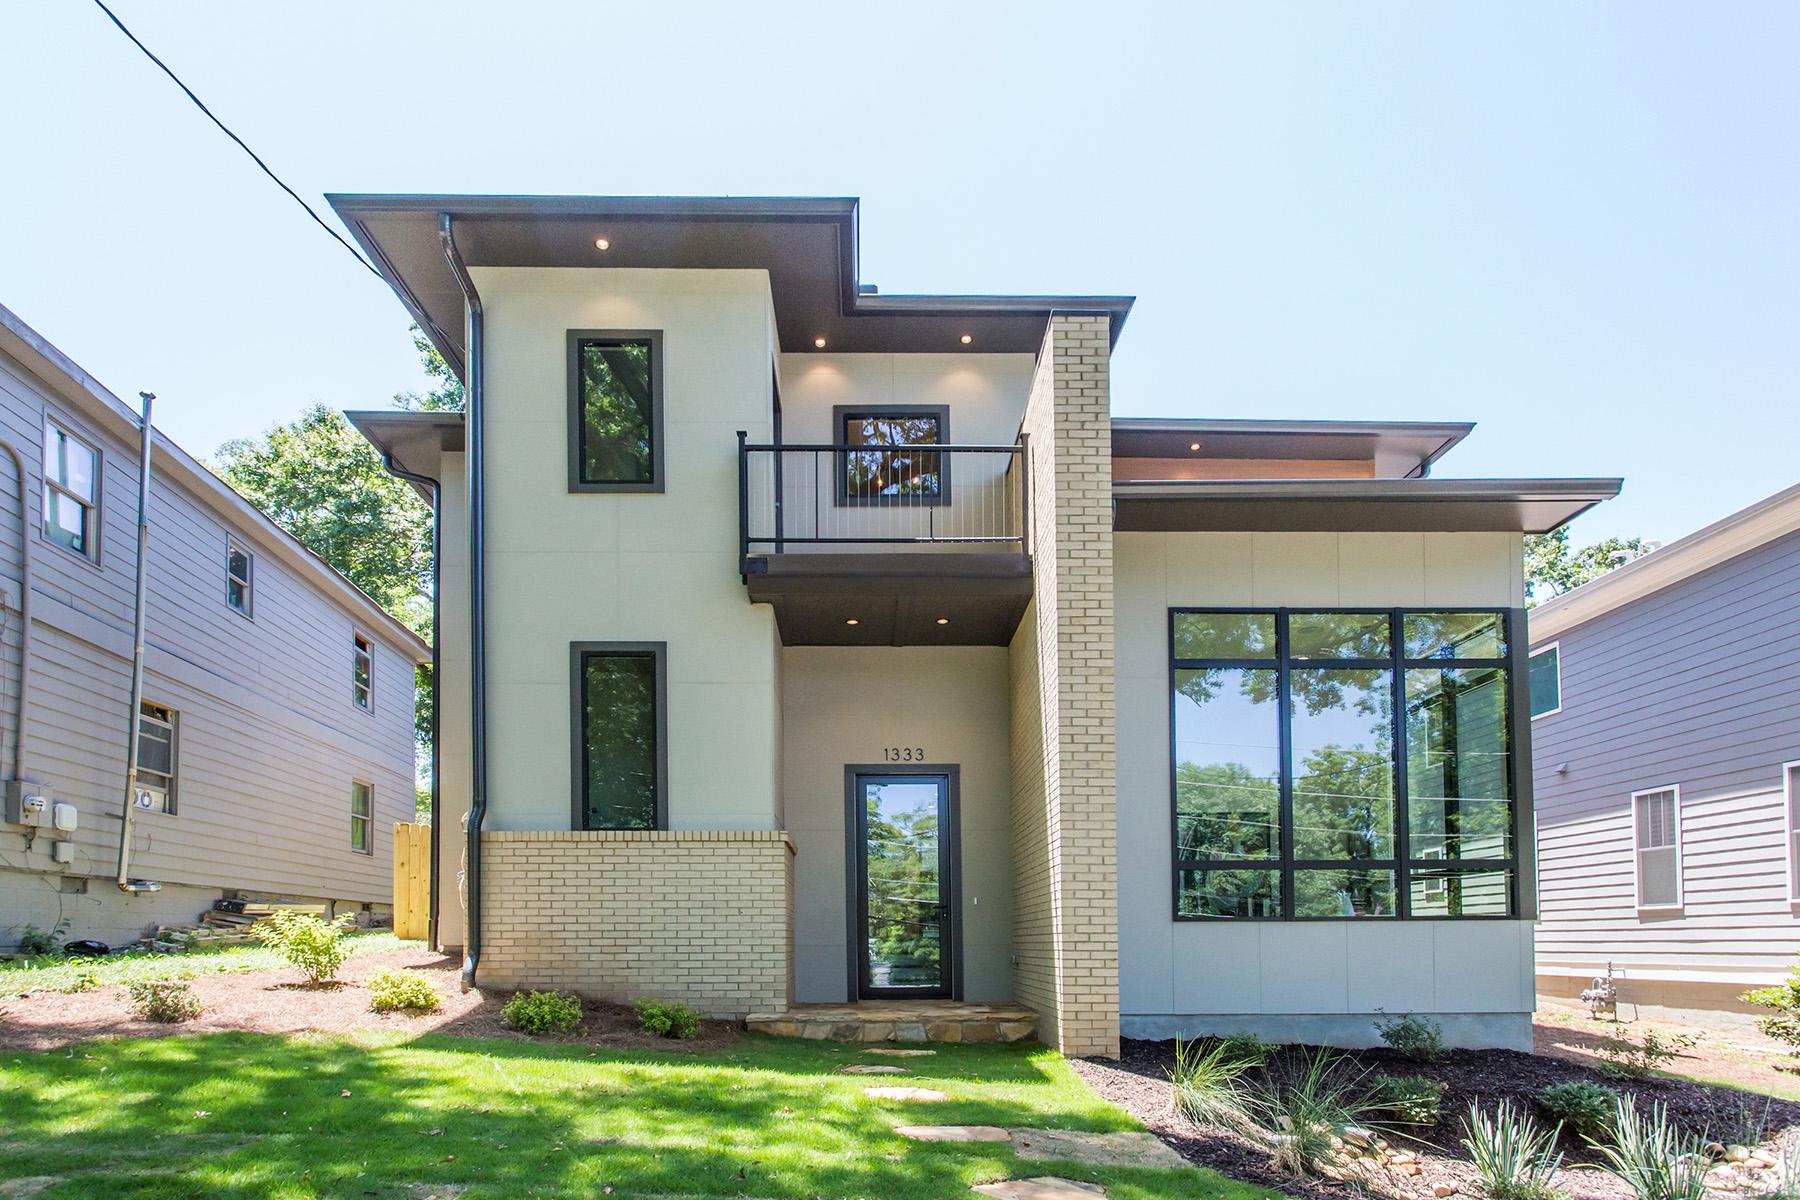 Single Family Home for Sale at Stunning Modern Prairie in Edgewood 1333 Hardee St Atlanta, Georgia 30307 United States